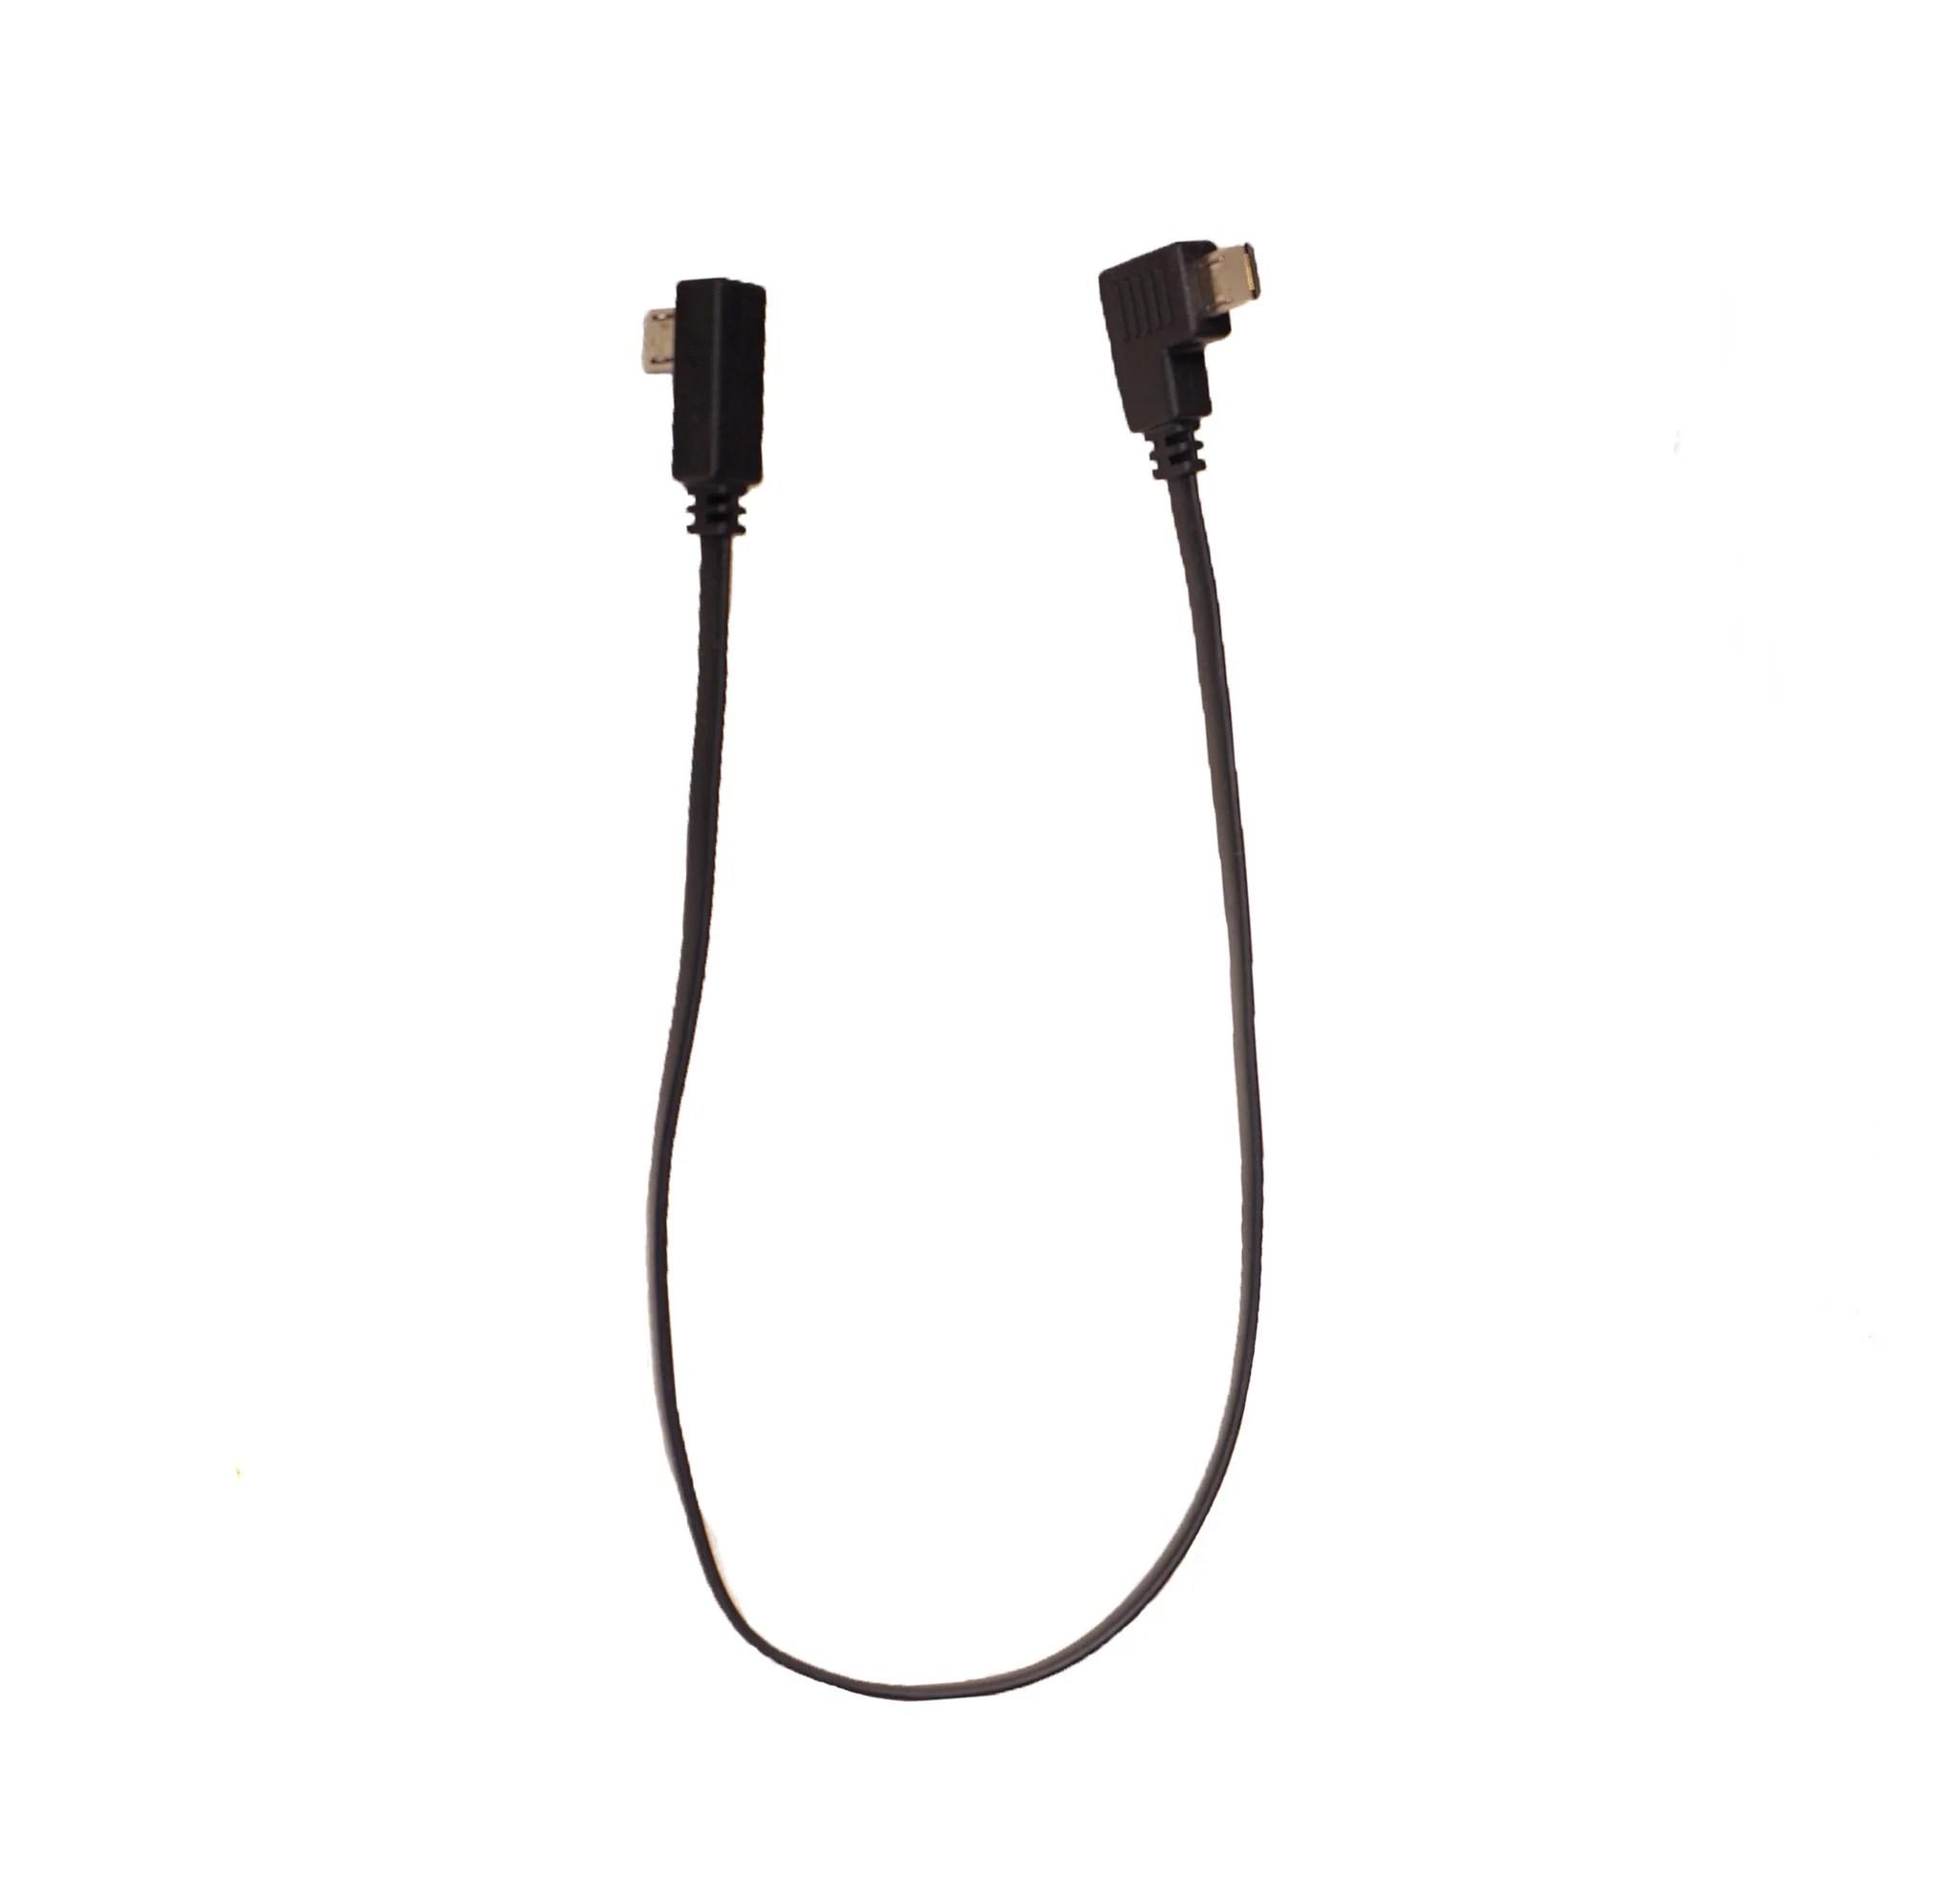 medium resolution of zhiyun camera connection cable